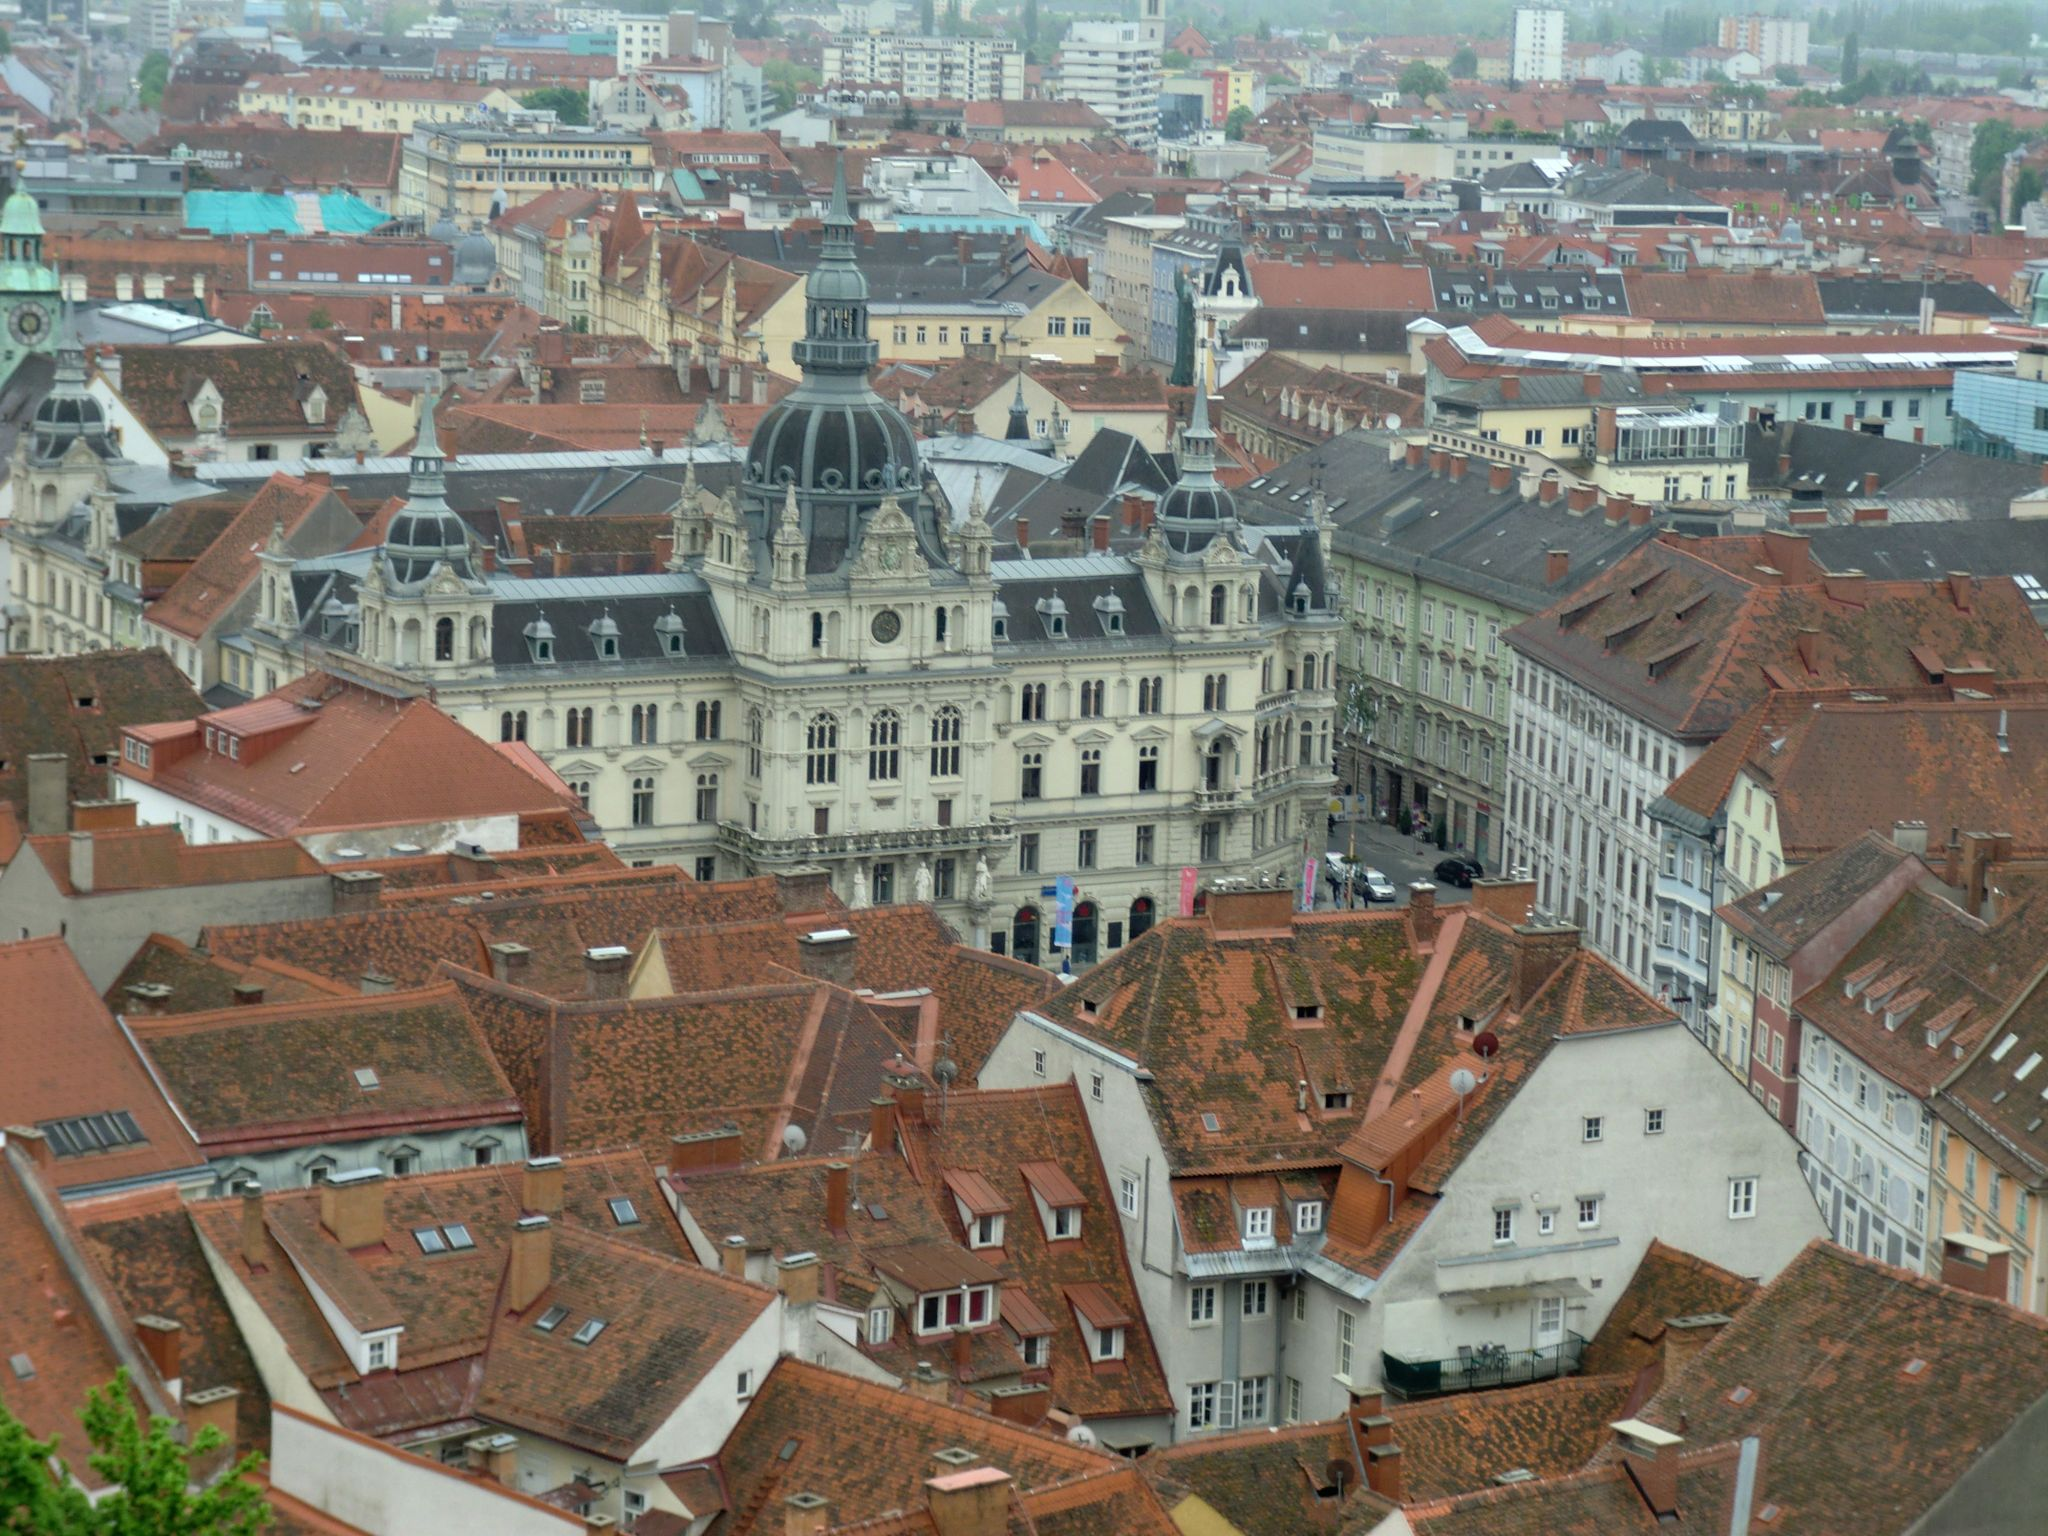 Graz cover 1 - Graz: tradition and modernity